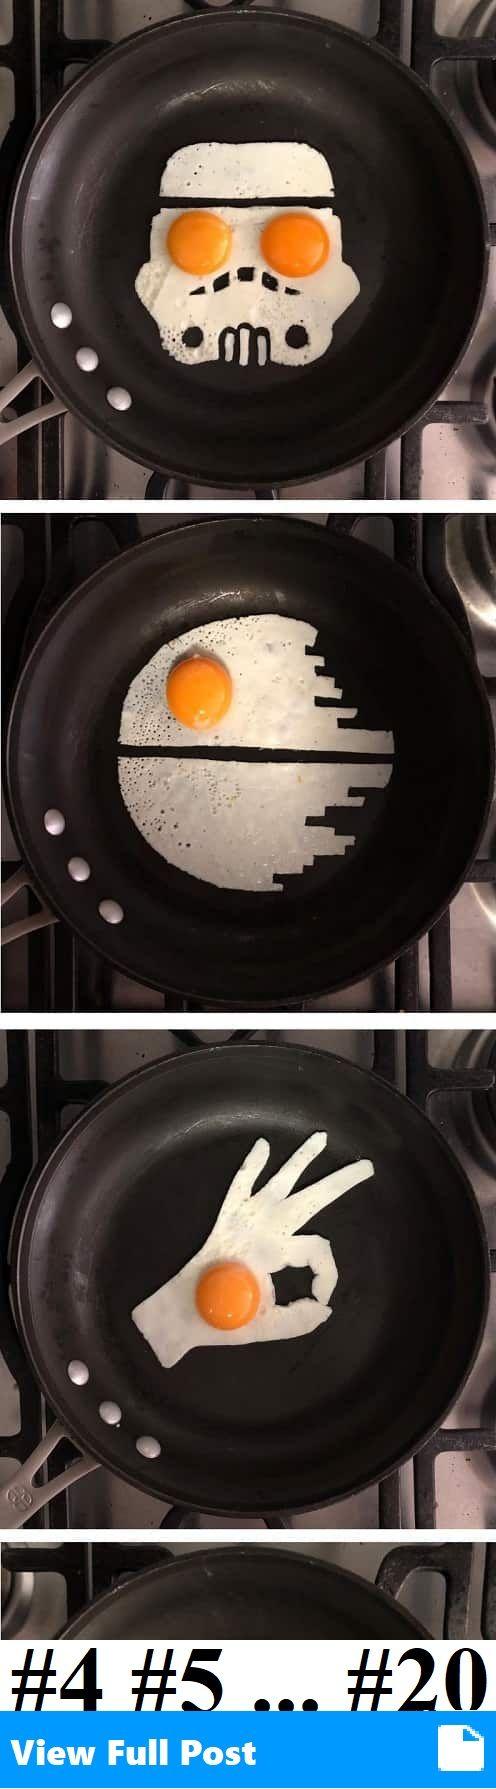 Creative Artist Turns His Breakfast Eggs Into Works Of Art